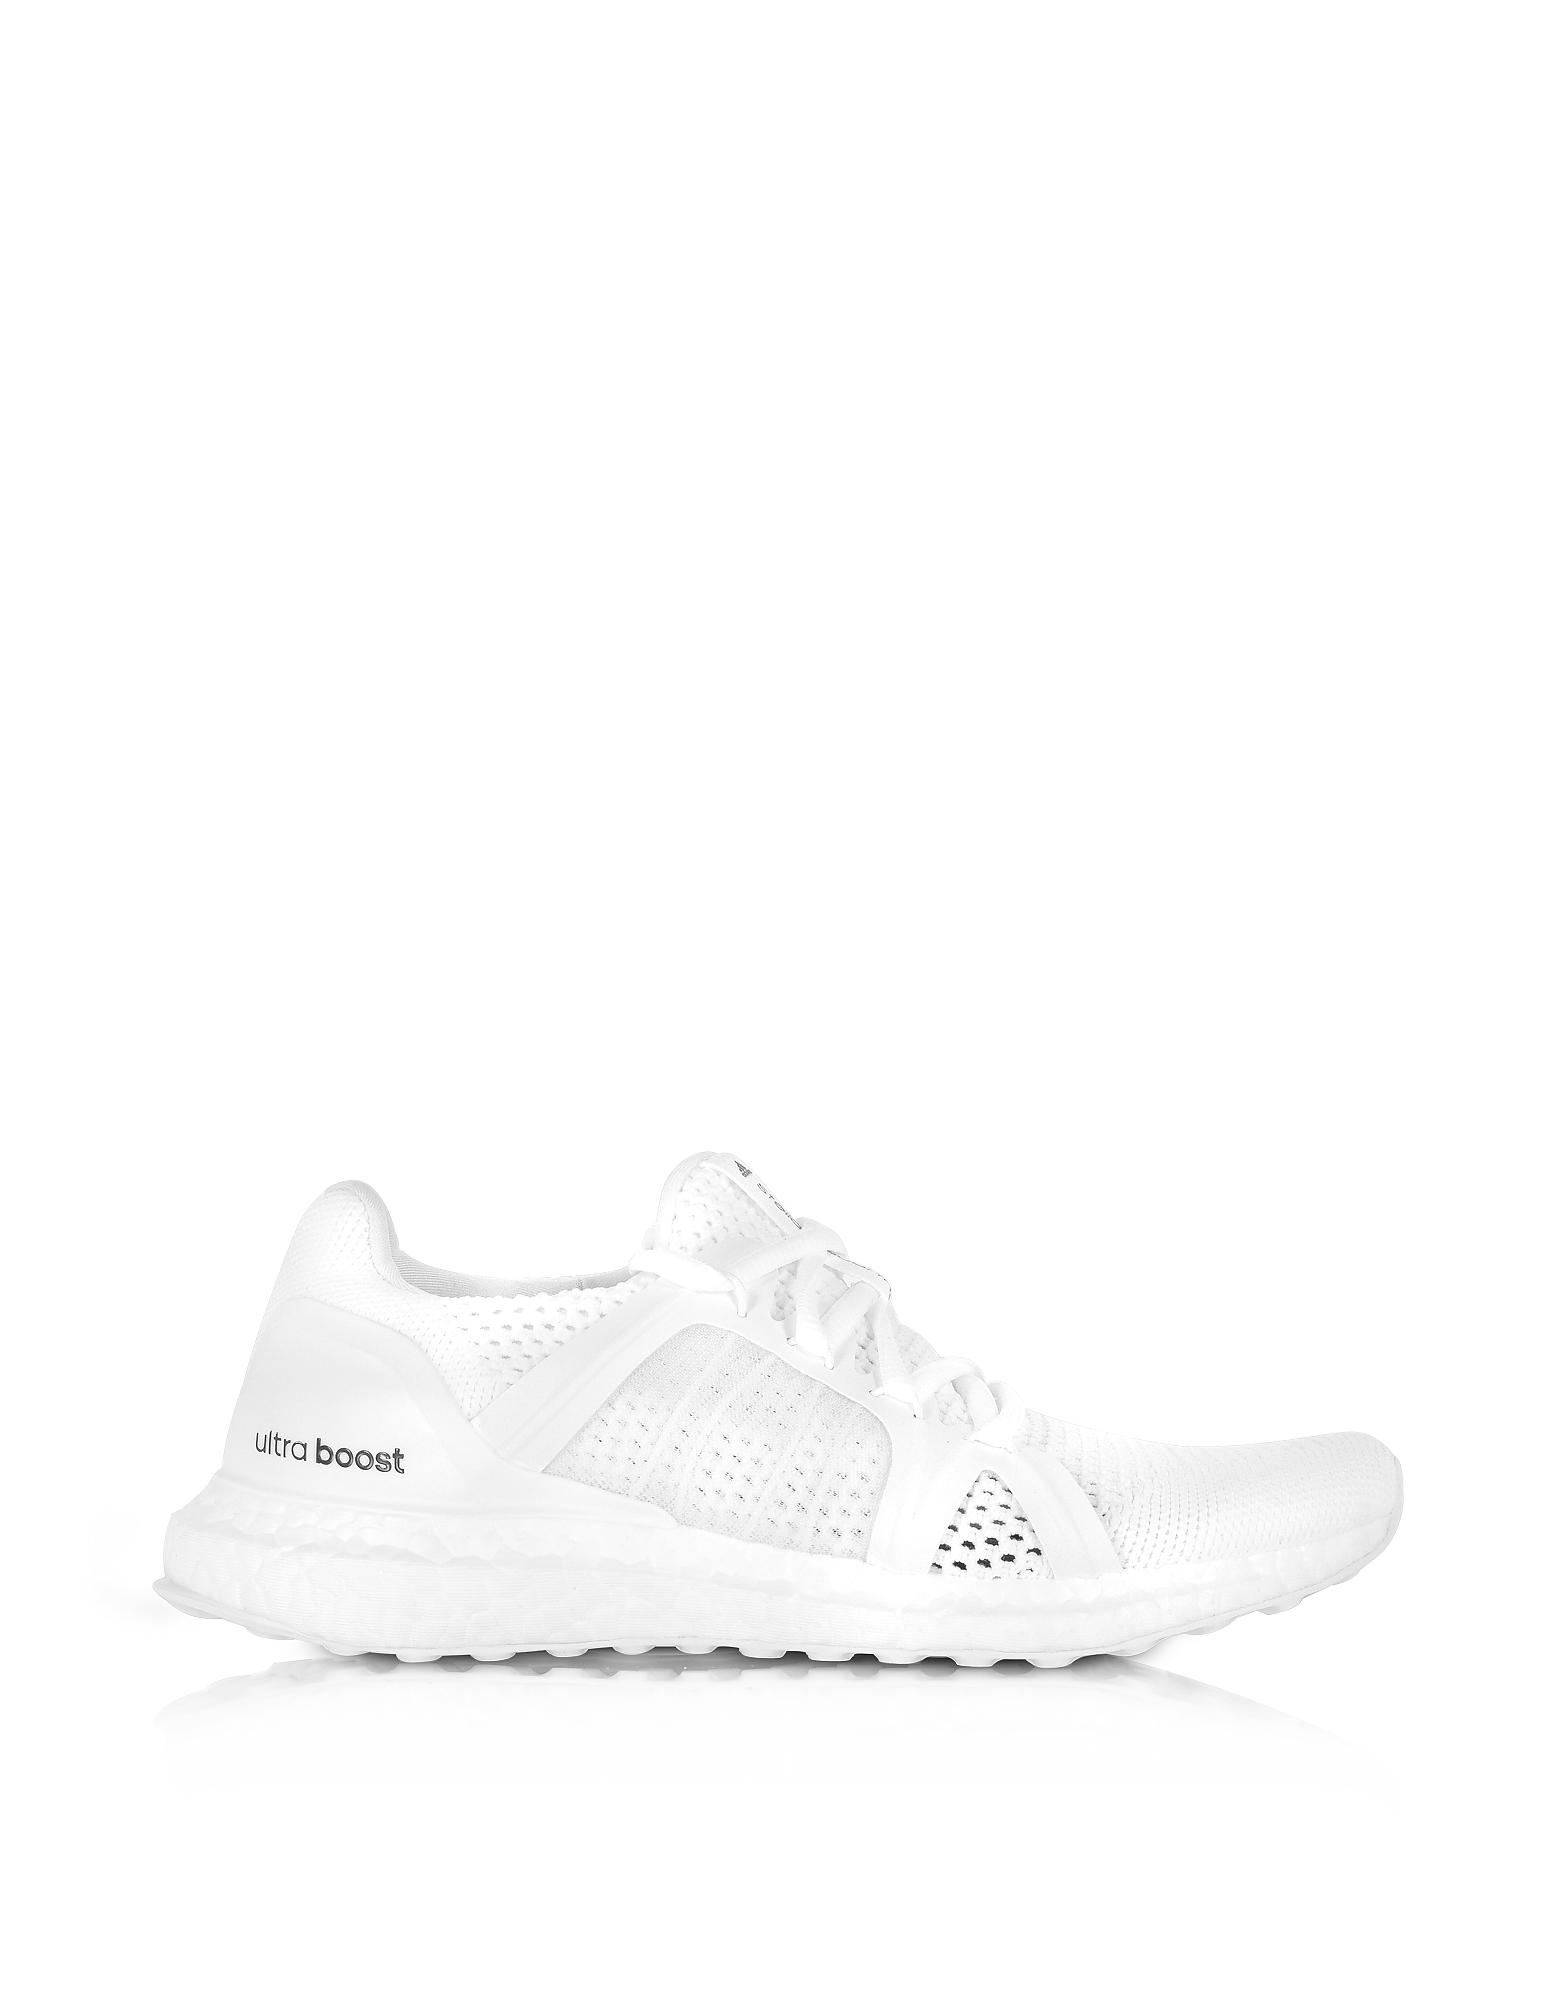 Adidas Stella McCartney Ultra Boost - Белые Женские Кеды